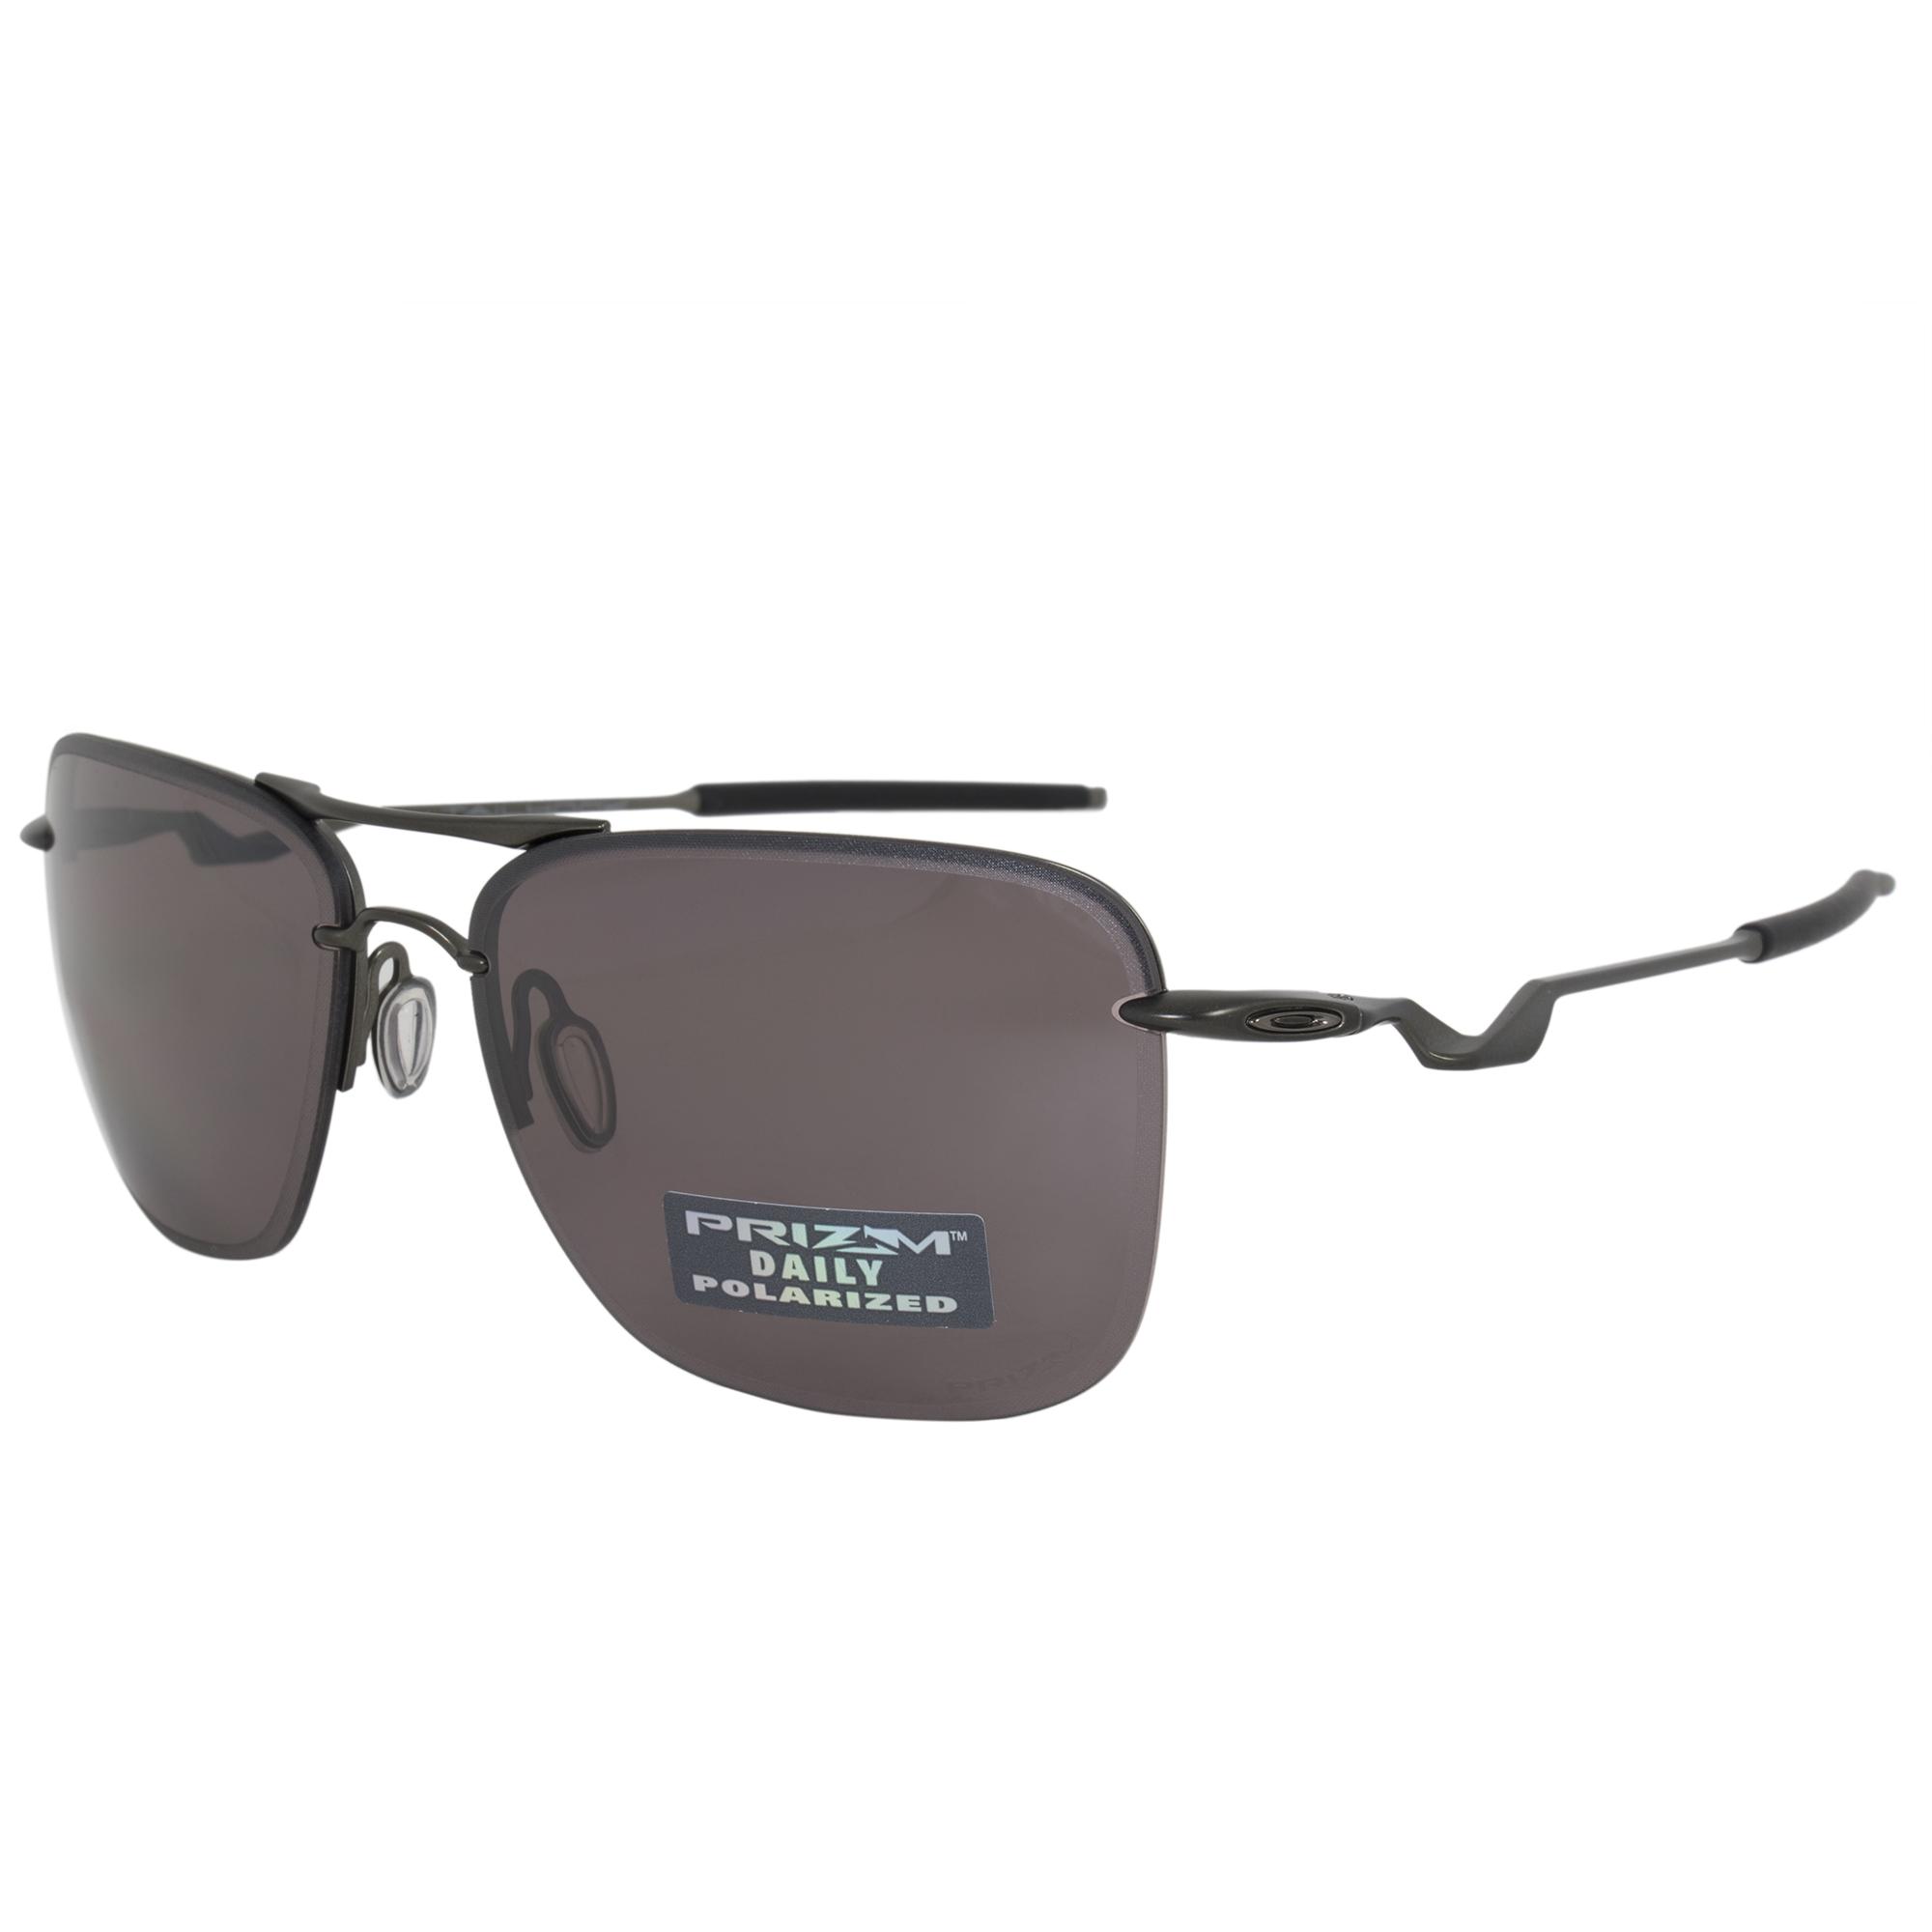 26770d4c510ec Oakley Tailhook Square Sunglasses 0OO4087 408705 60 POL